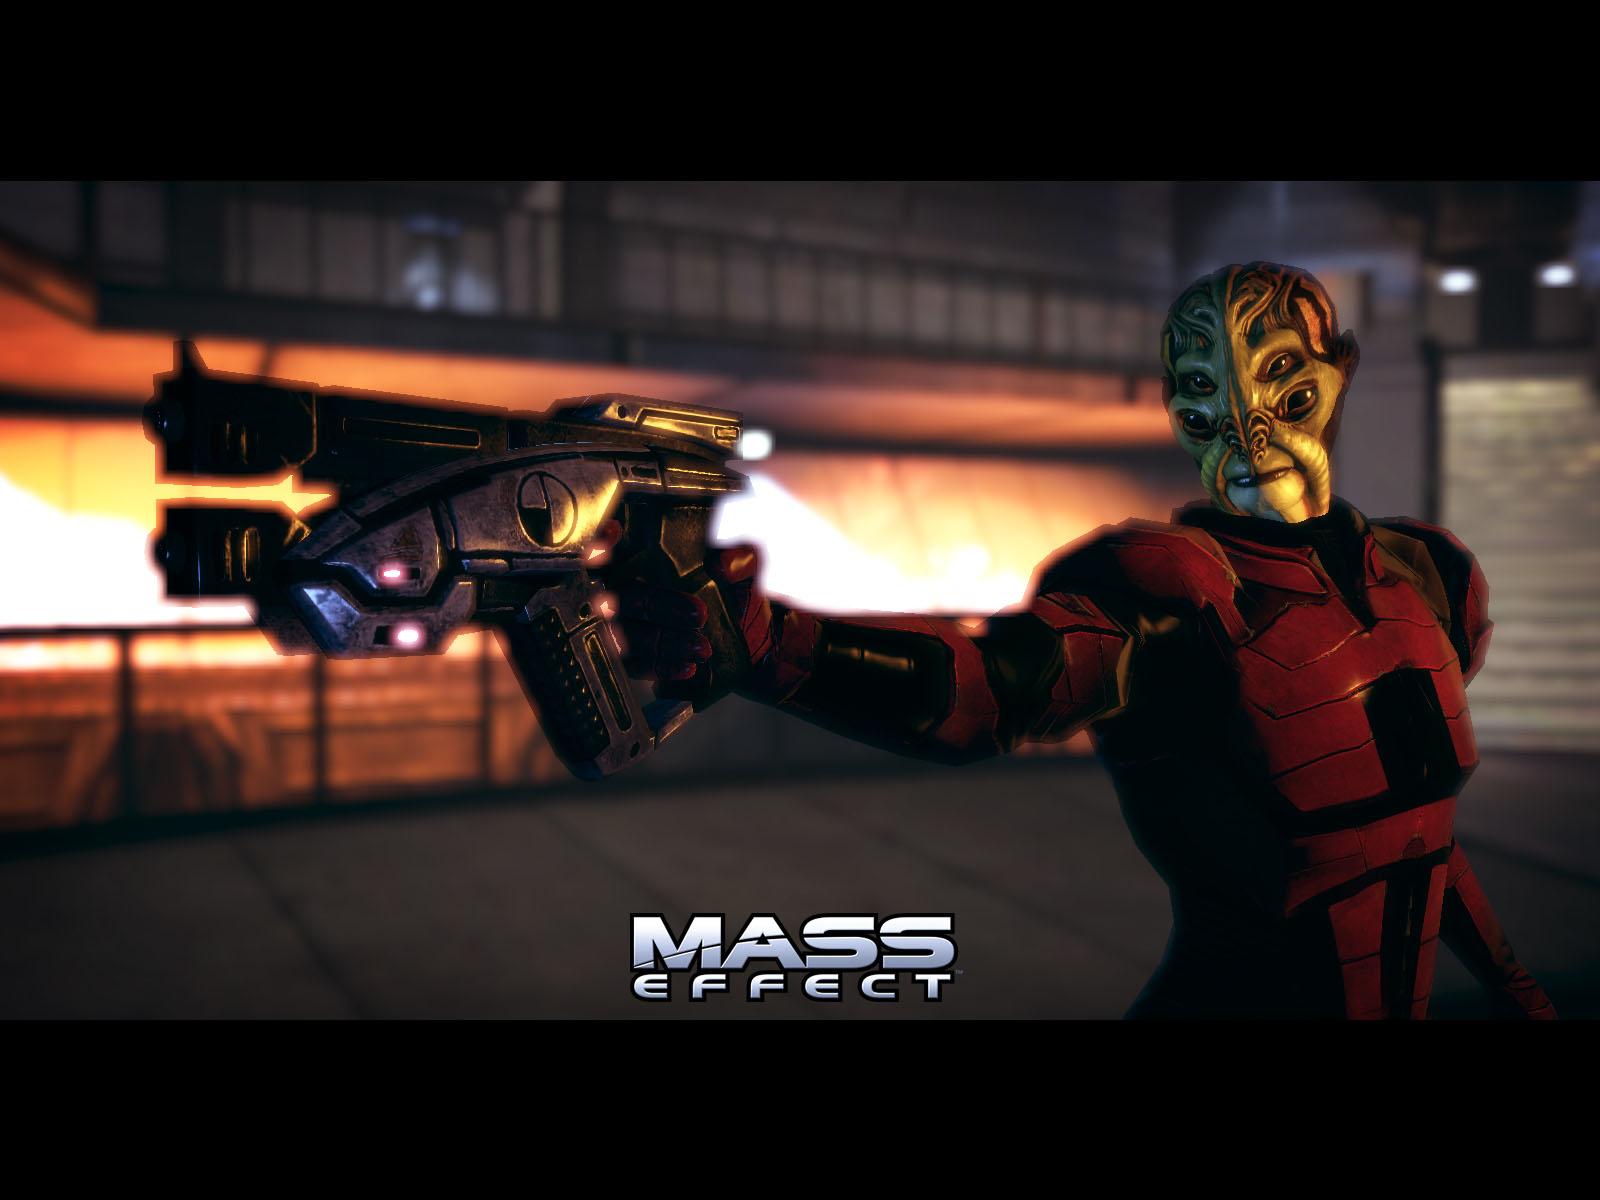 Wallpapers Mass Effect Wallpapers